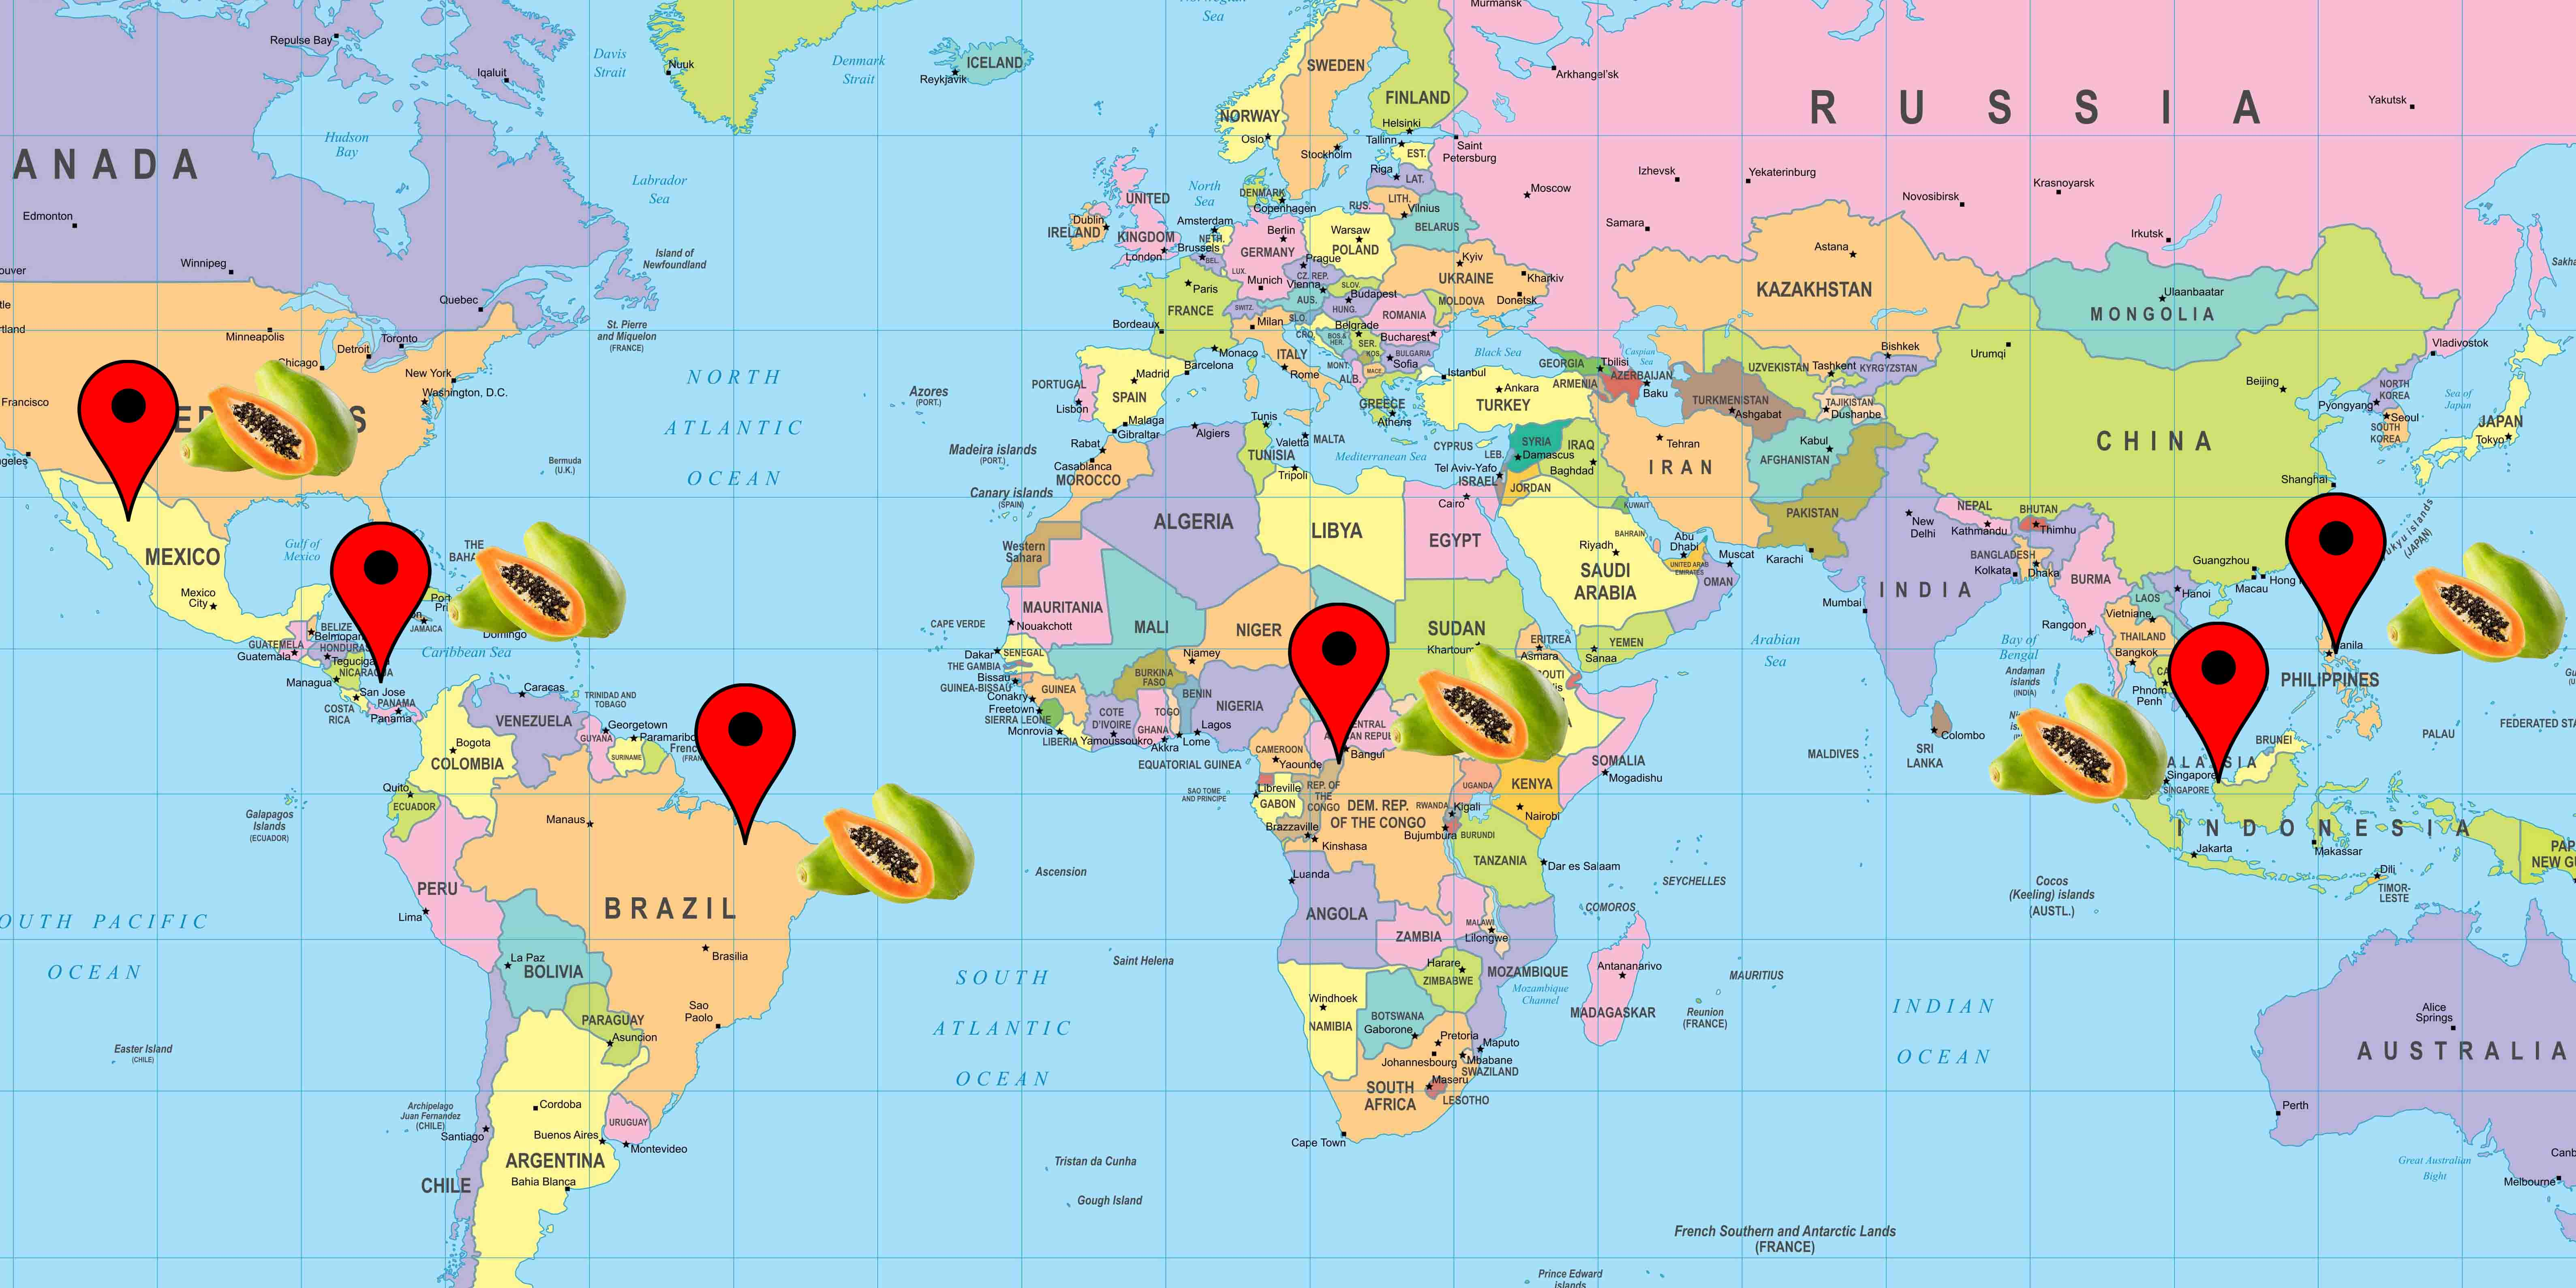 Cartina origine distribuzione papaya